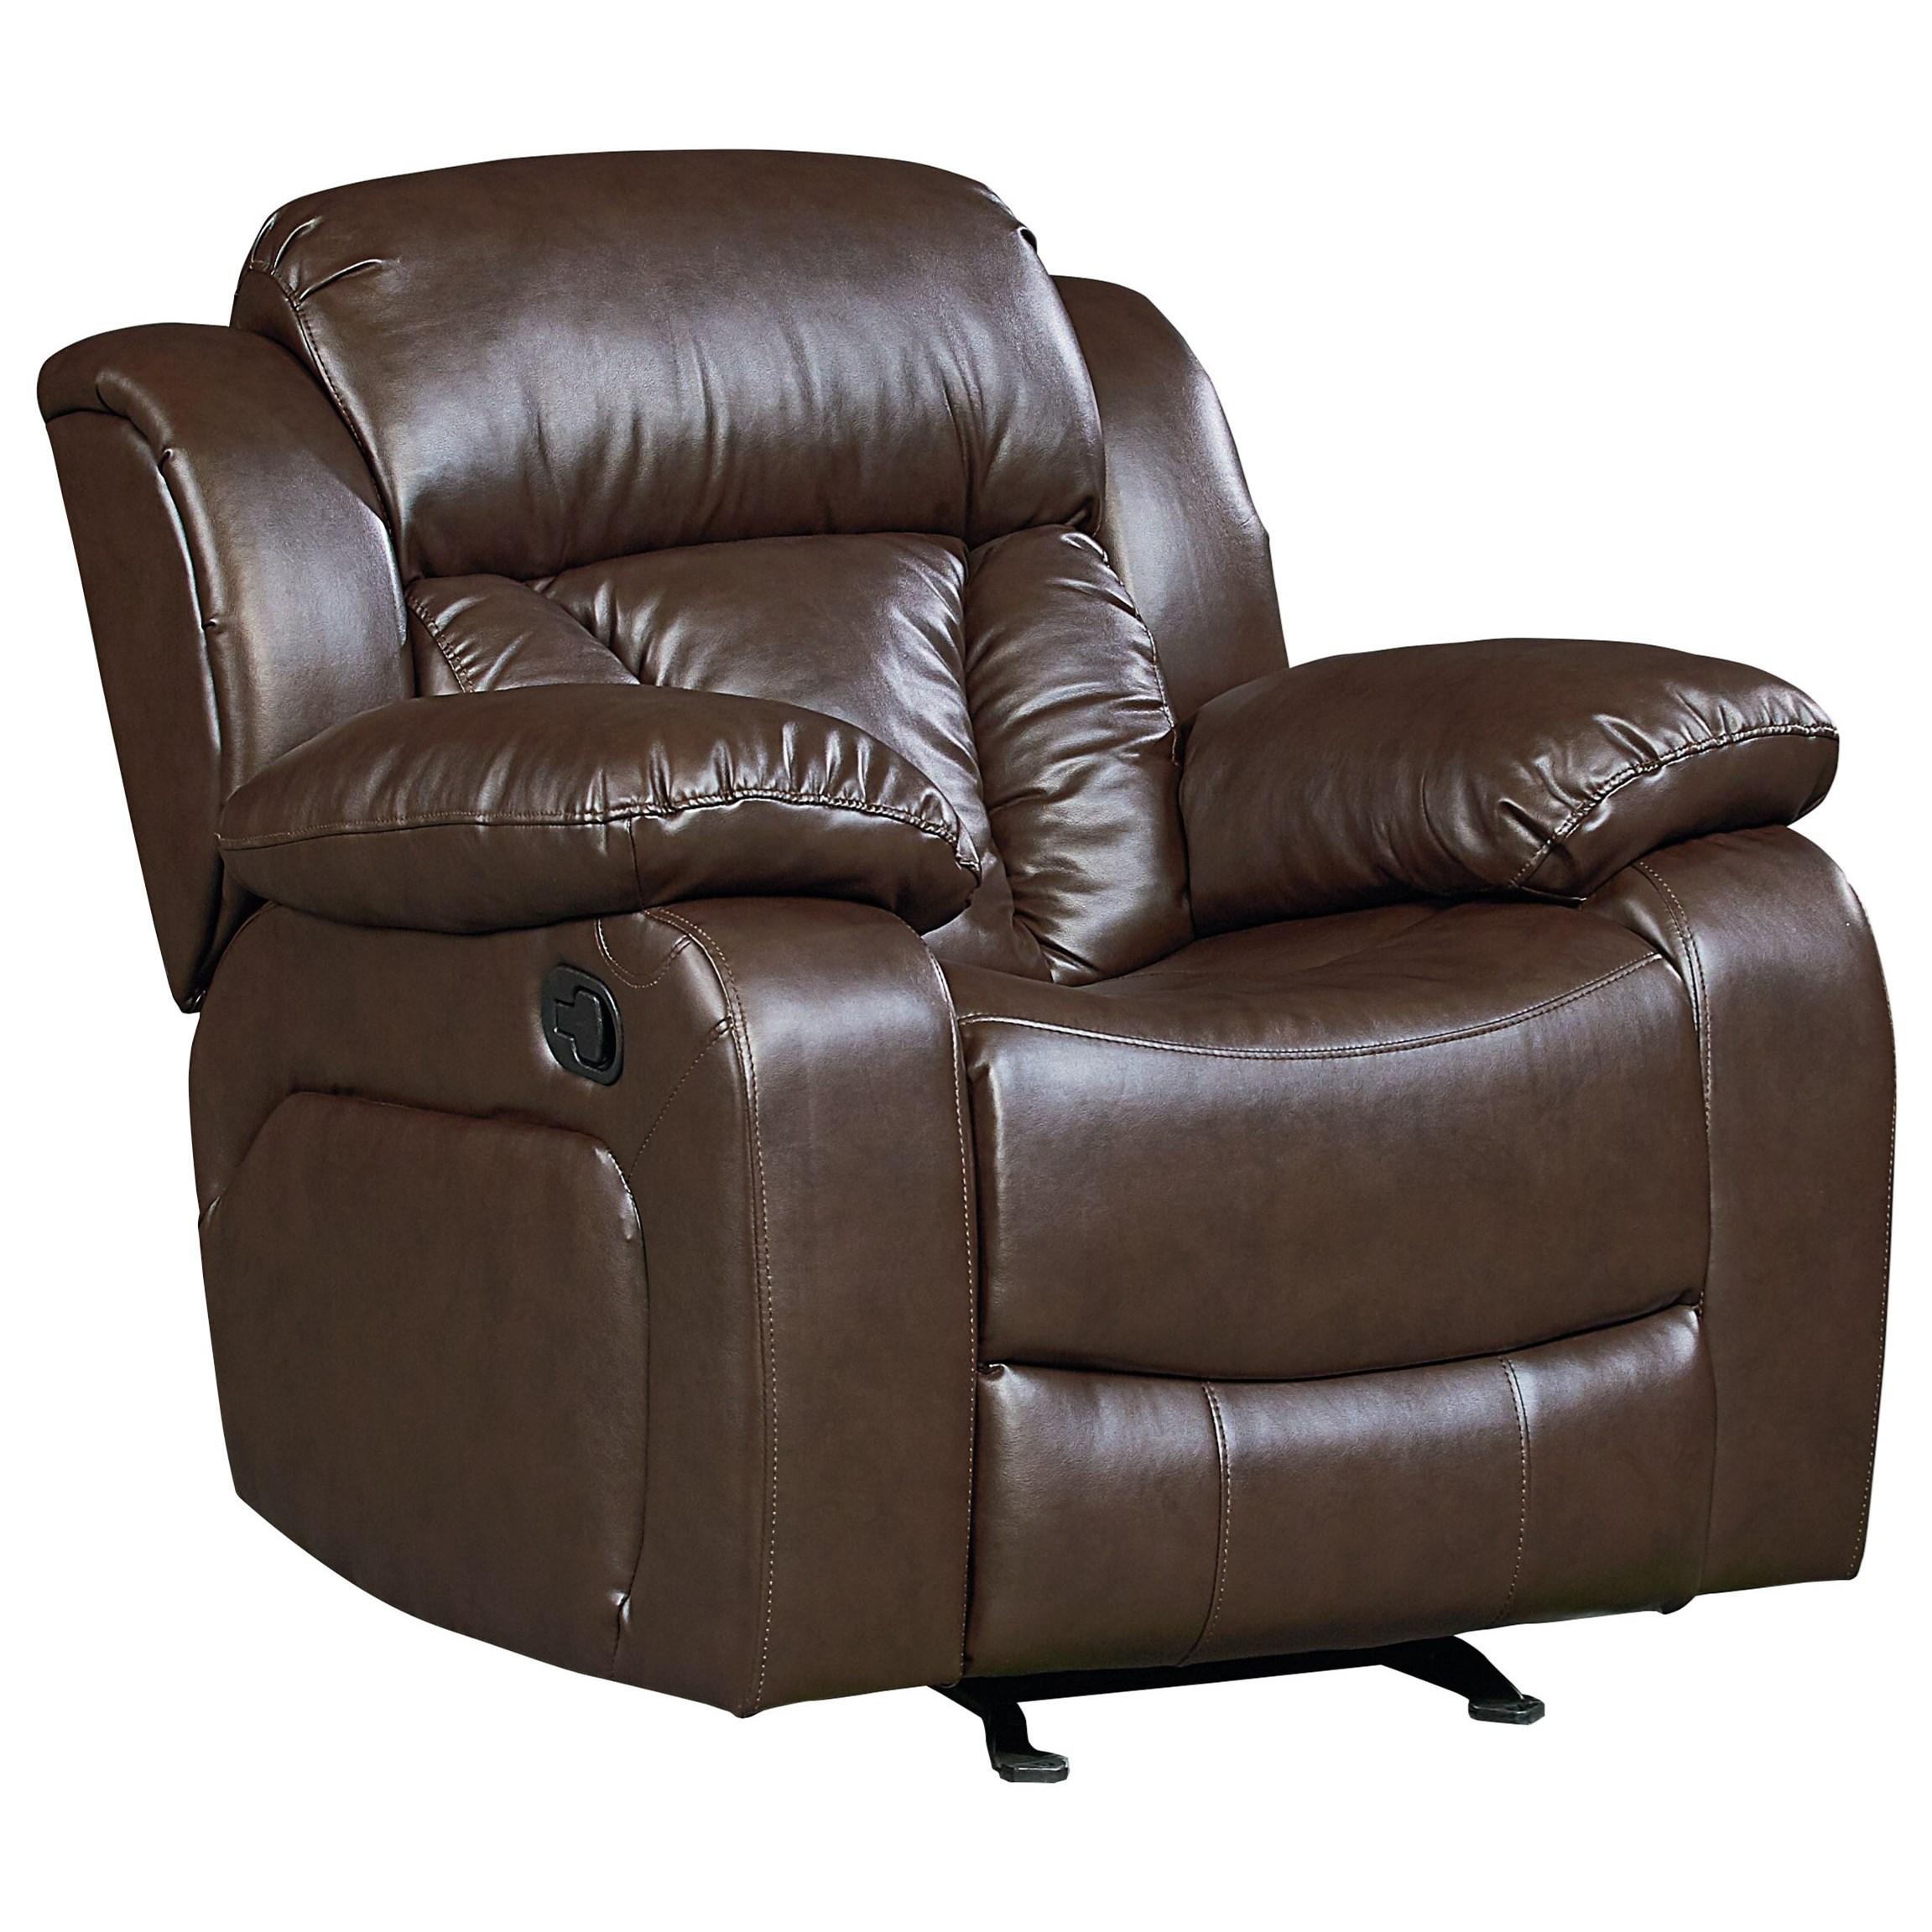 Standard Furniture North Shore Rocker Recliner - Item Number: 4003981